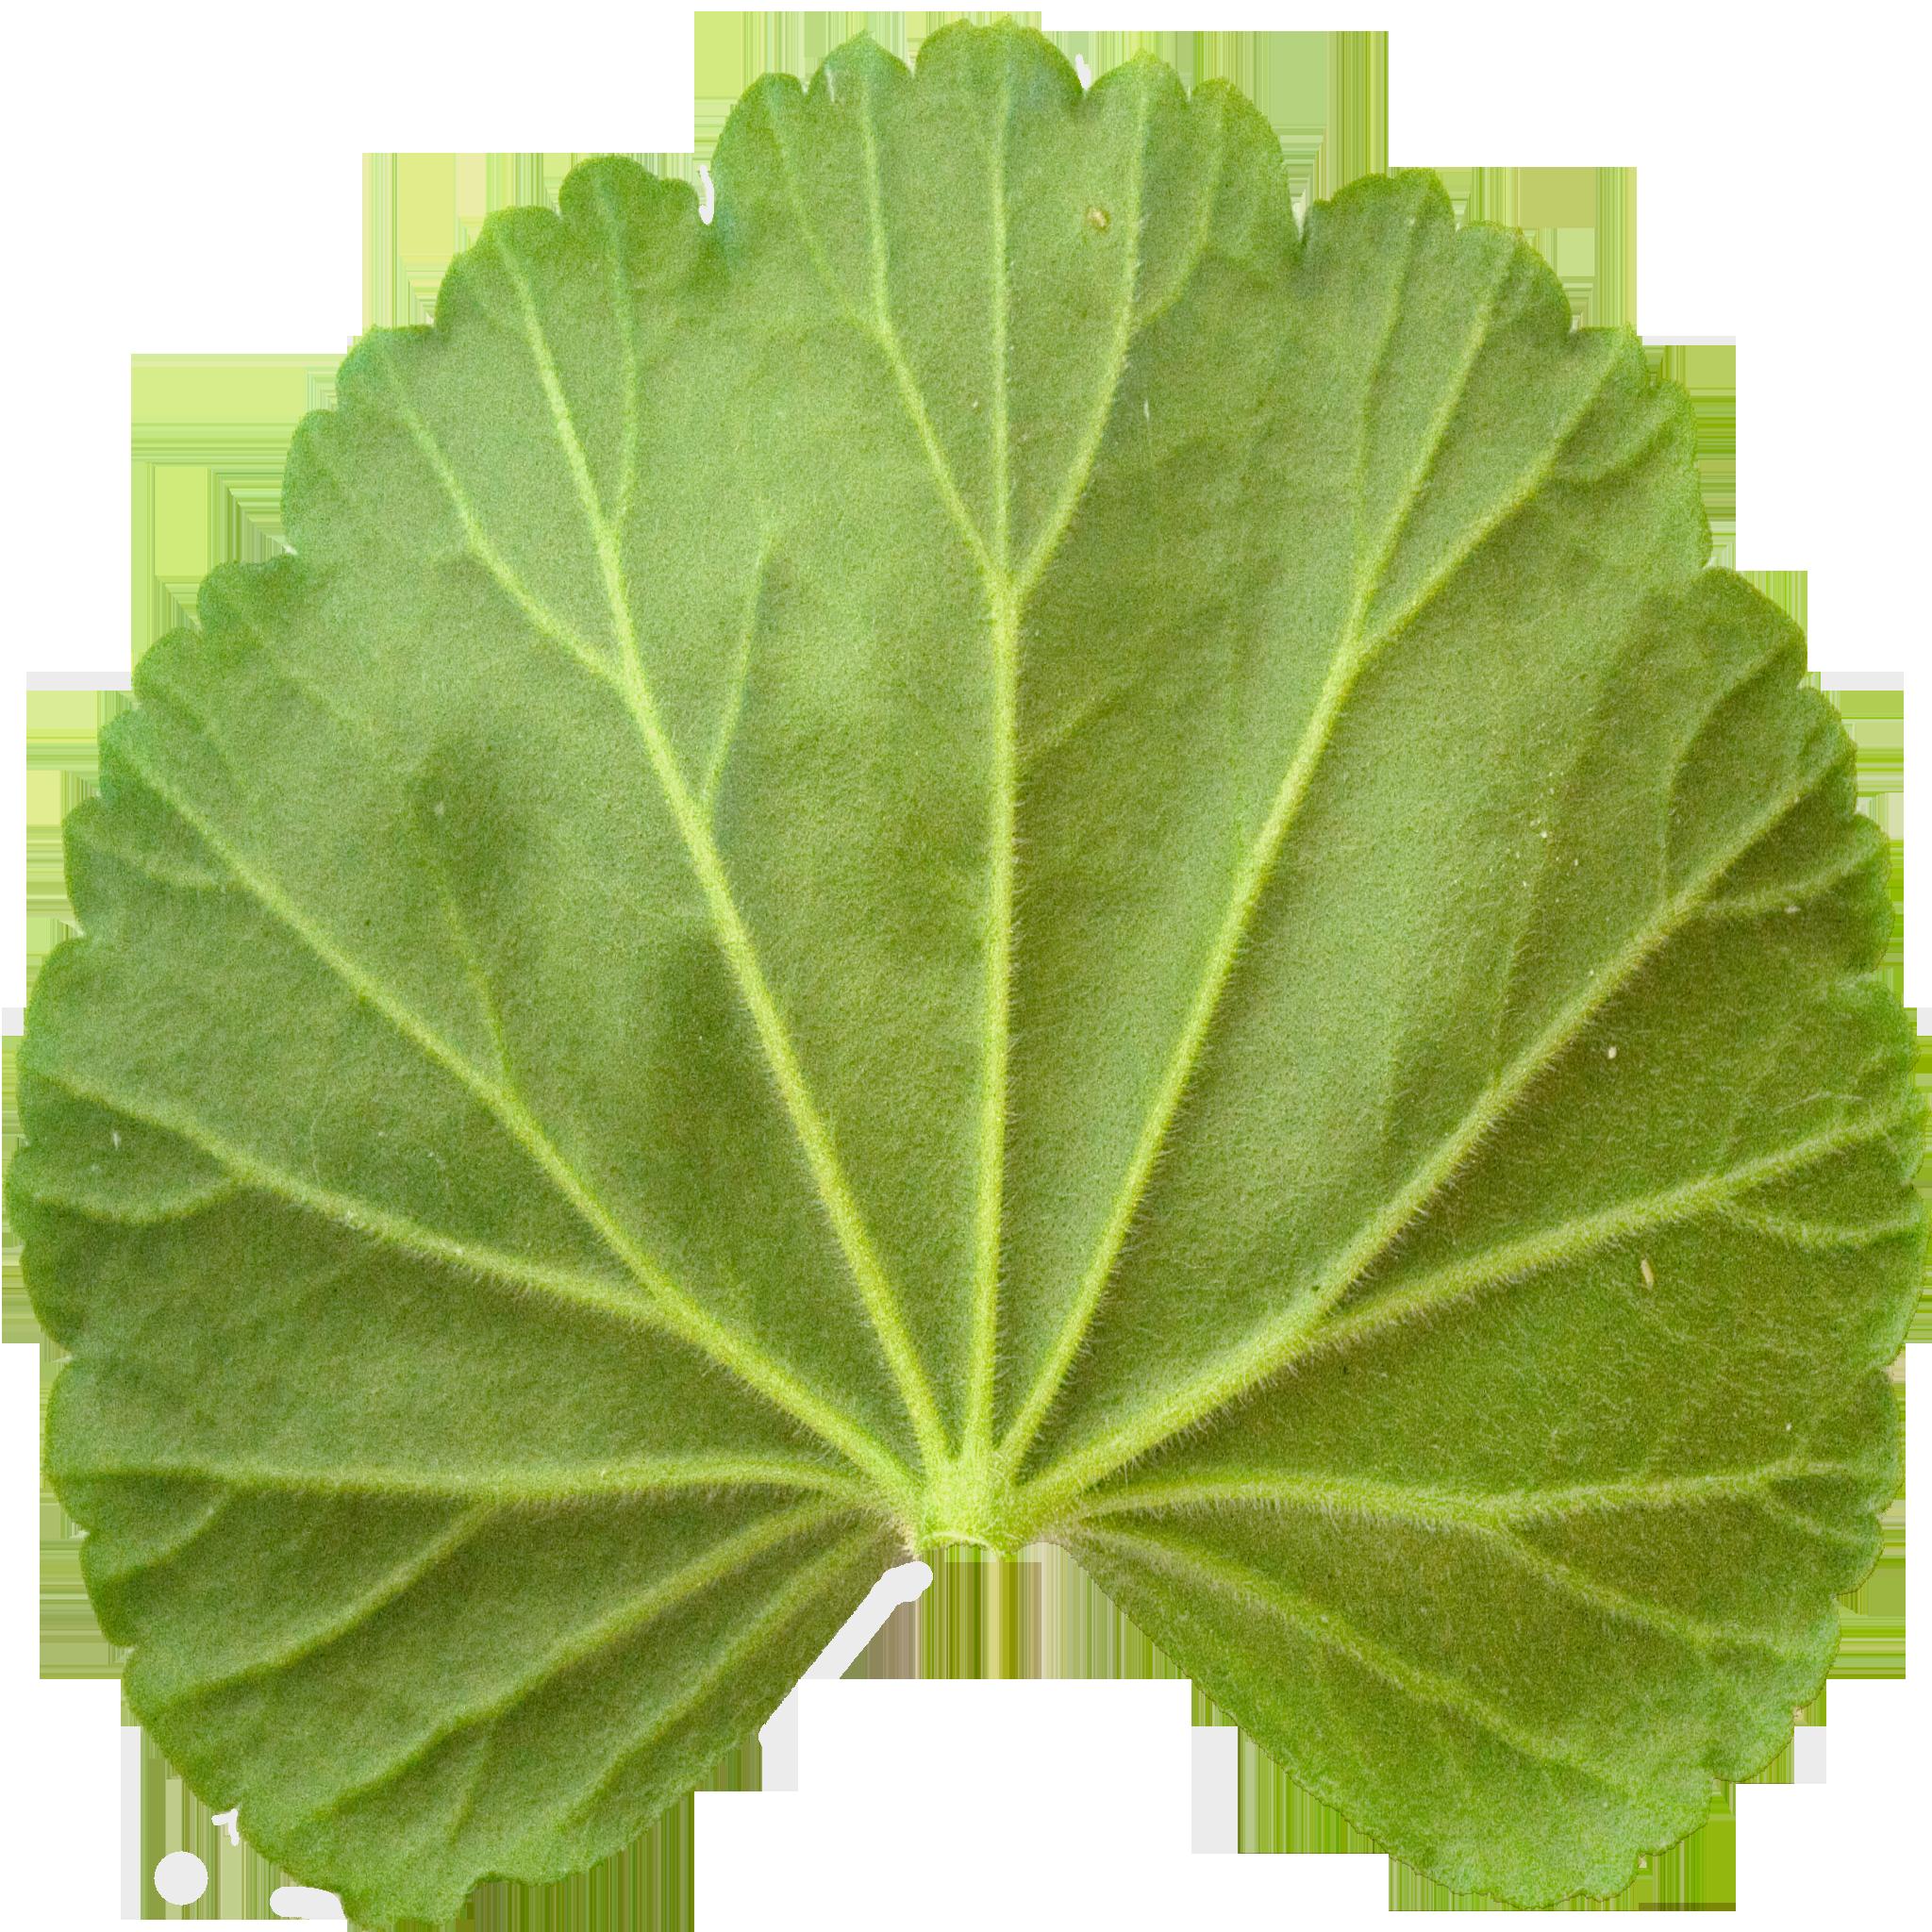 Bottom Geranium Leaf.png